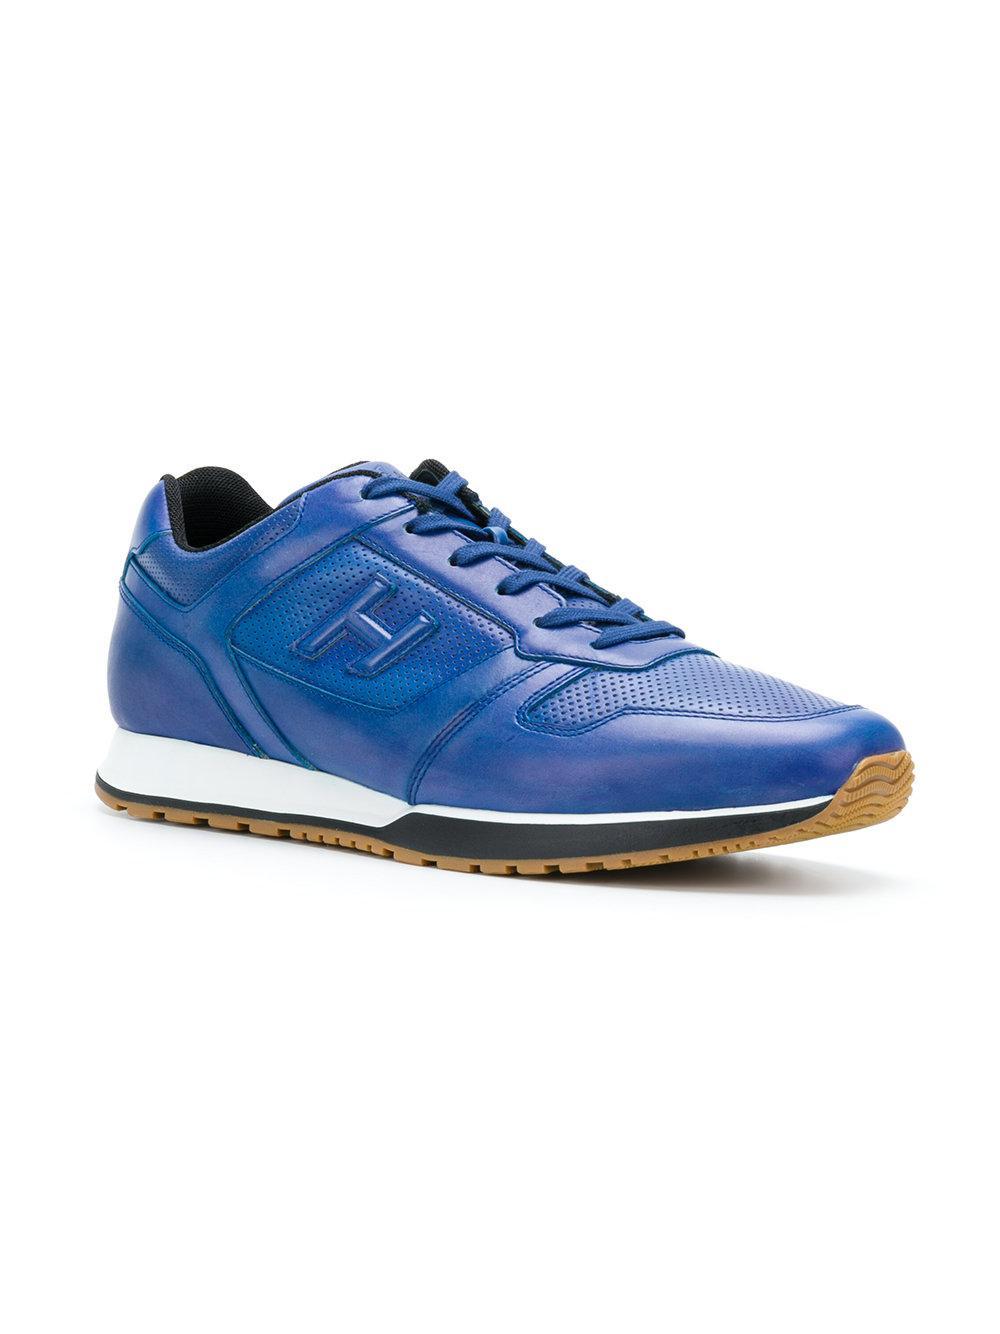 urban sneakers - Blue Hogan 2oAJ7hoK